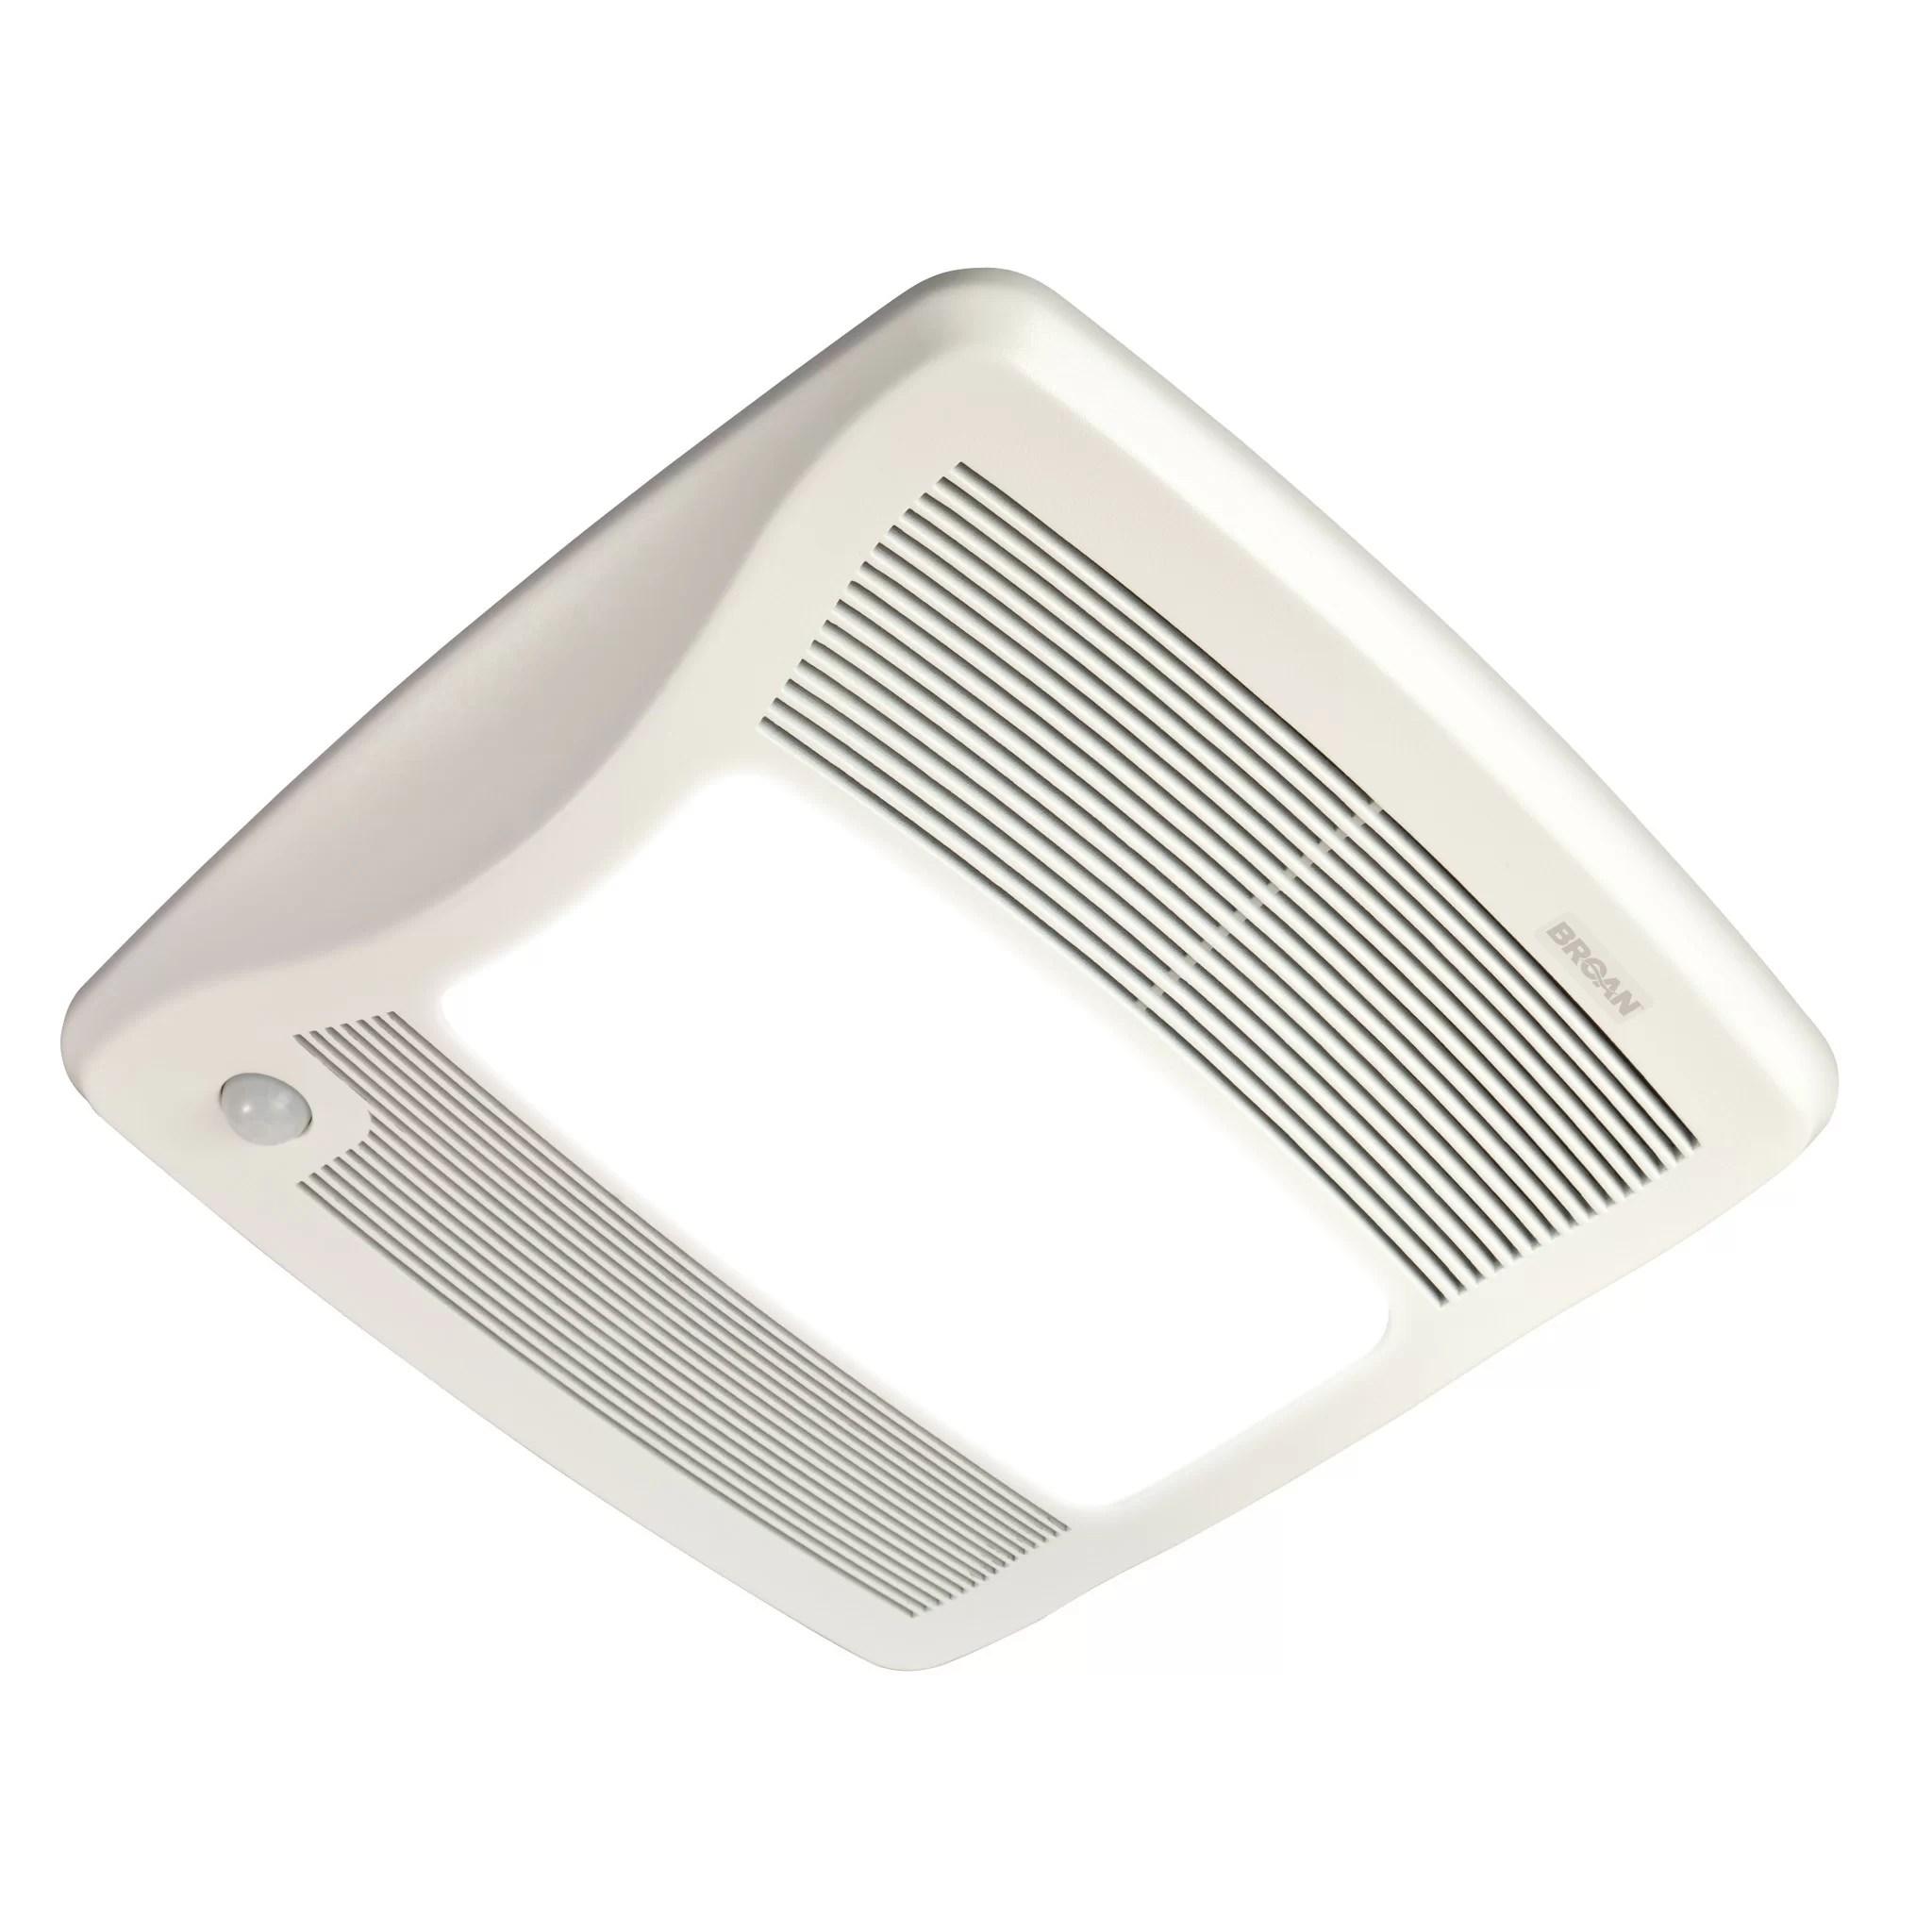 Broan Ultra Series 110 CFM Energy Star Bathroom Fan with Light  Wayfair